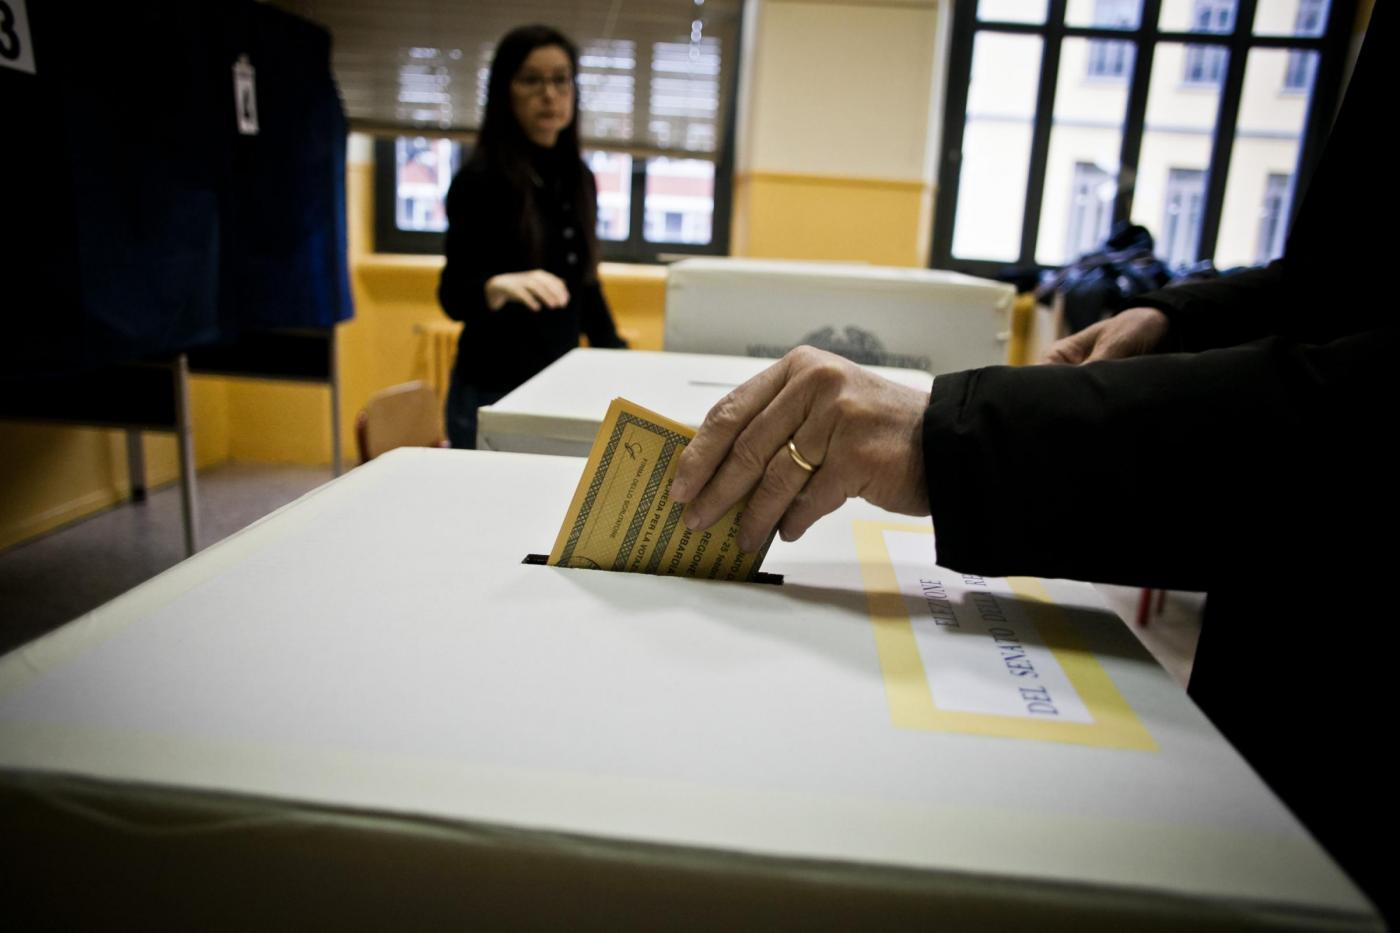 elezioni 2013 affluenza alle urne definitiva ha votato